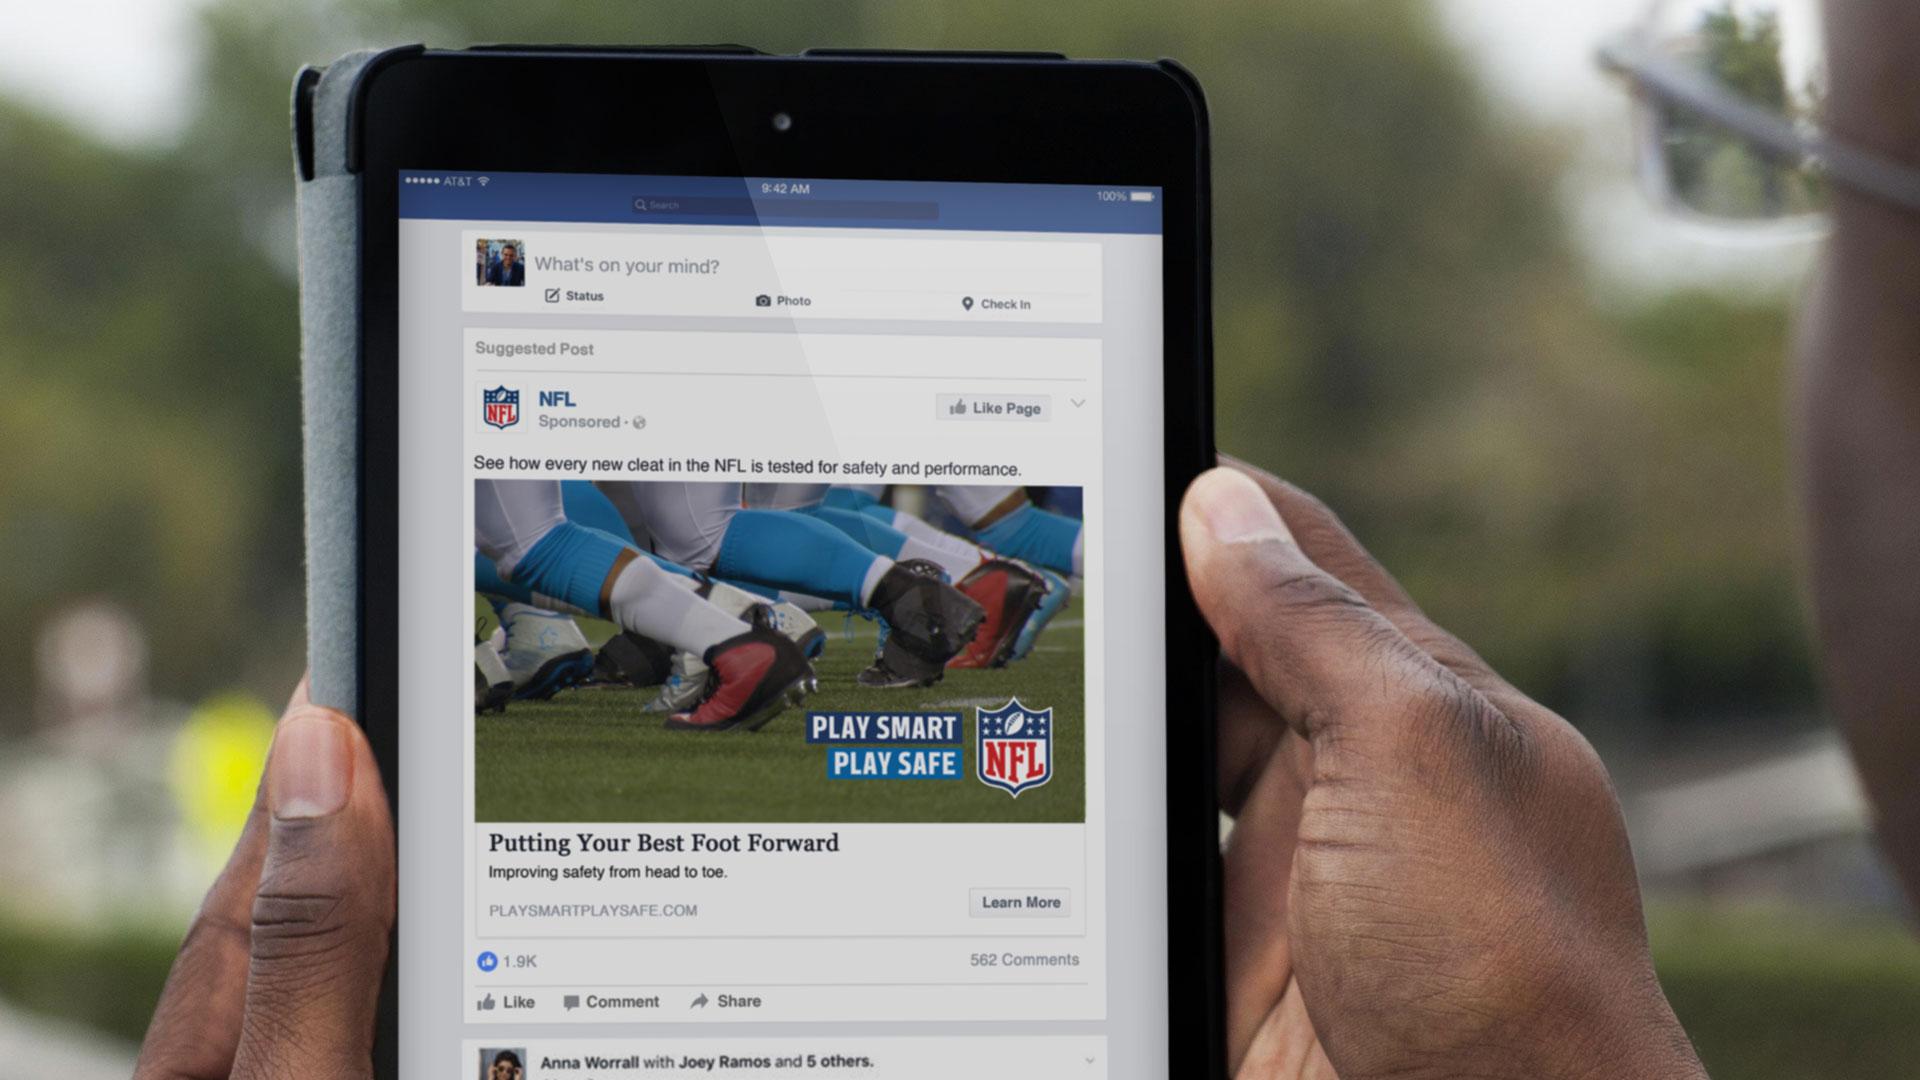 _NFL_FoF_Facebook_iPad.jpg